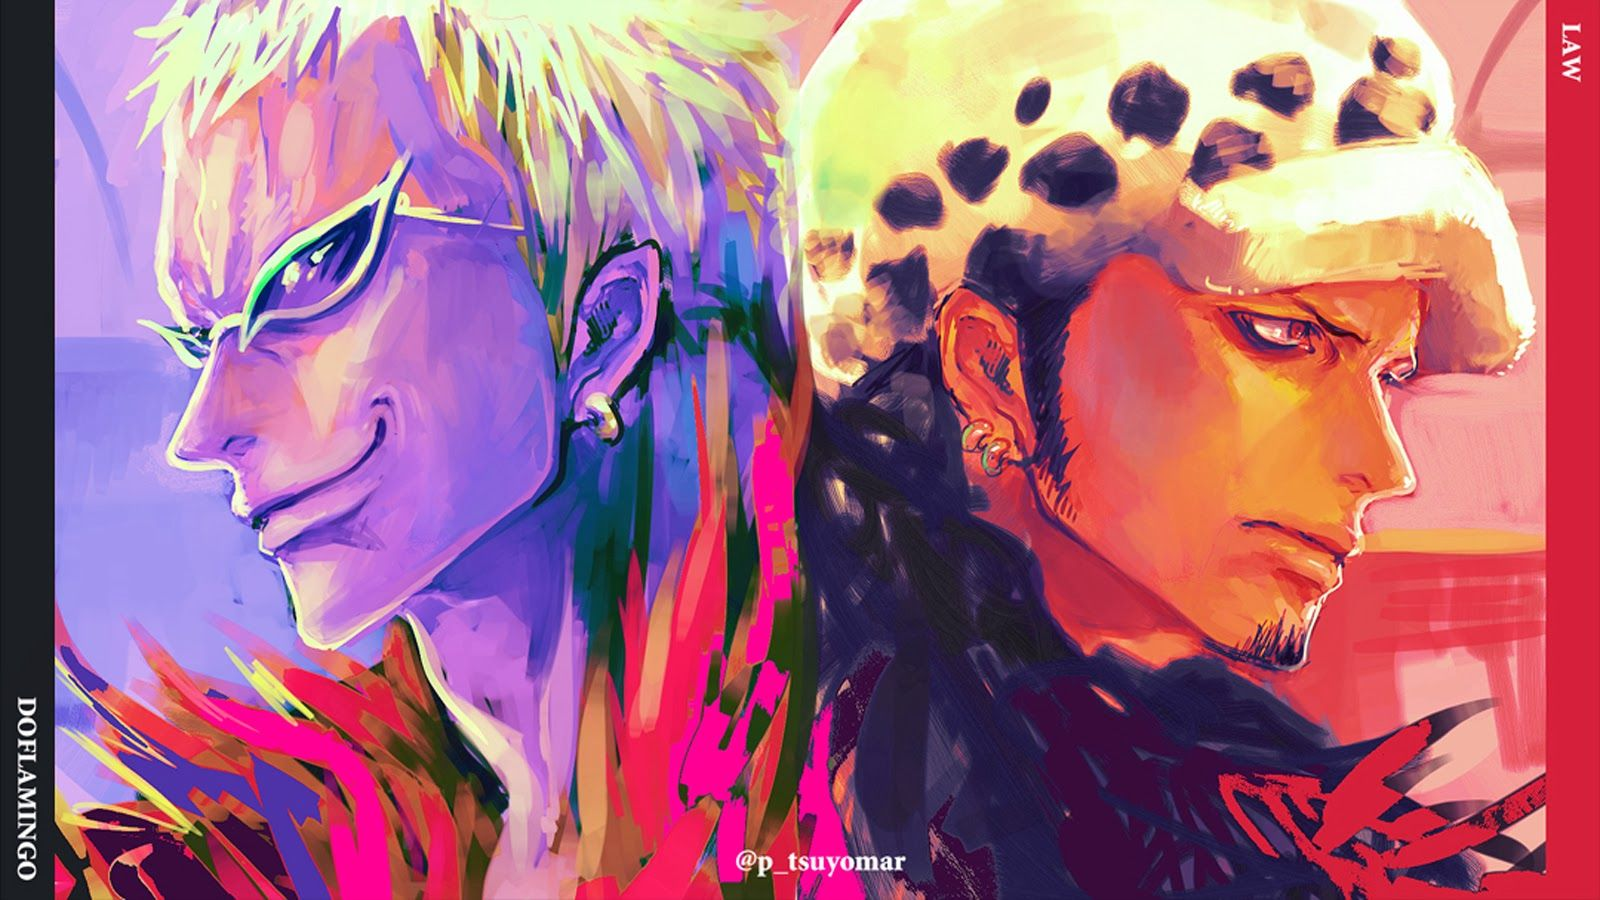 Anime One Piece Doflamingo Wallpaper | One Piece | Pinterest